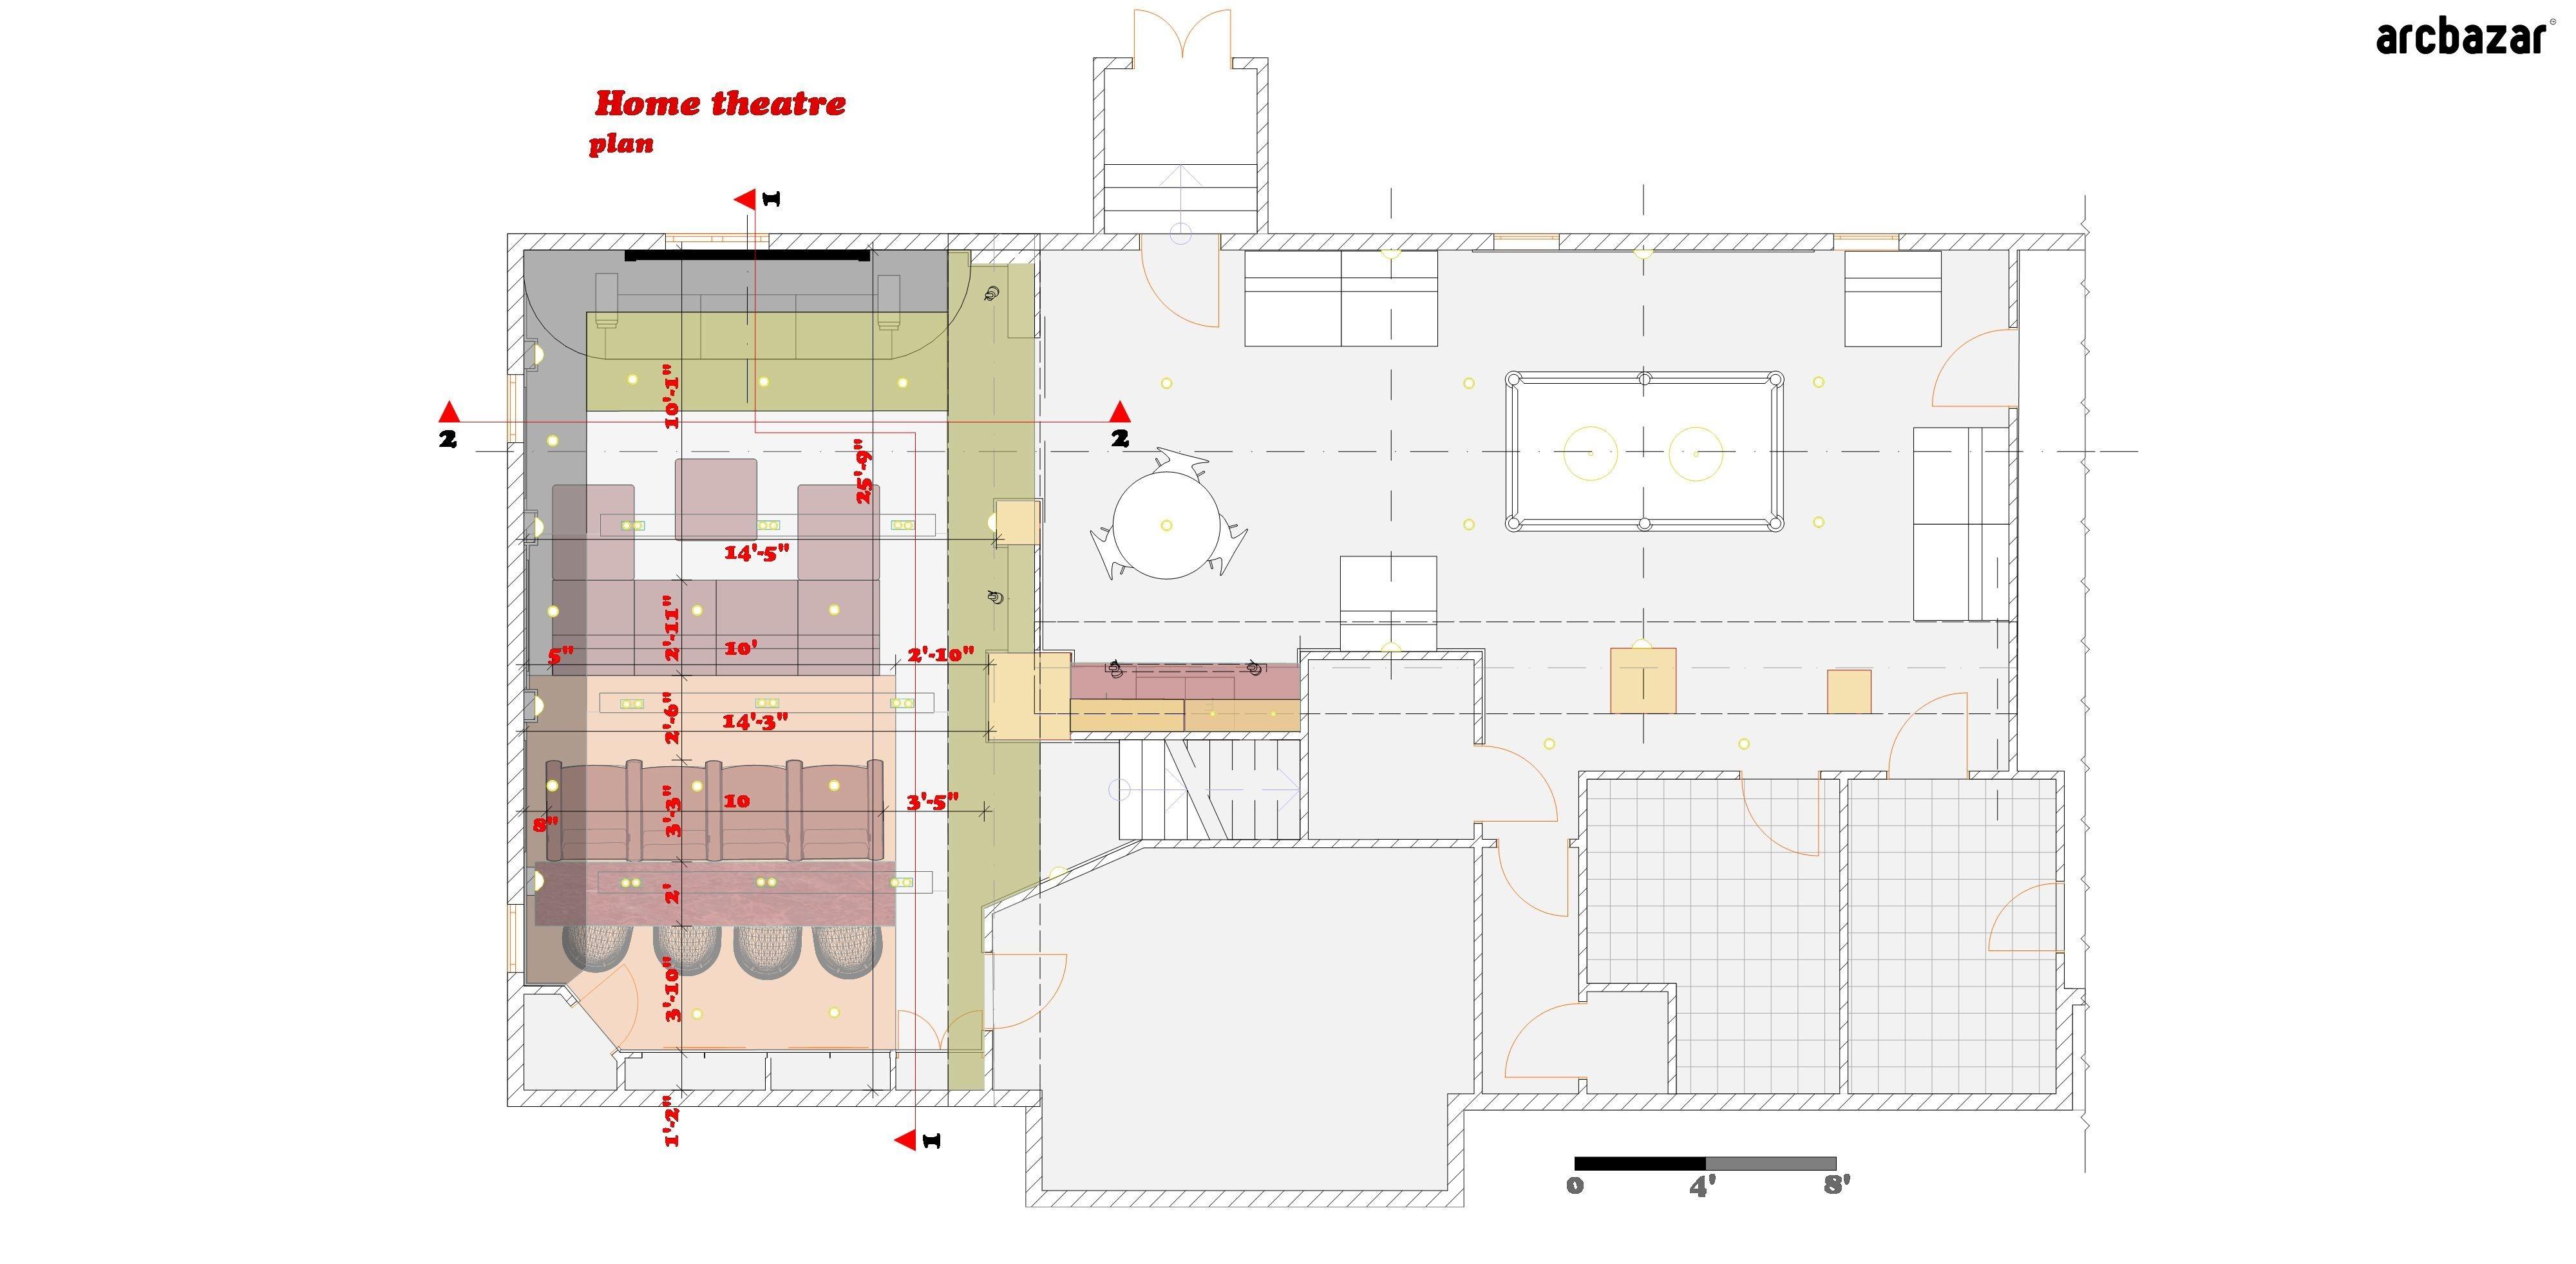 Home Theatre design submission by Marina Dil via http://arcbazar.com ...